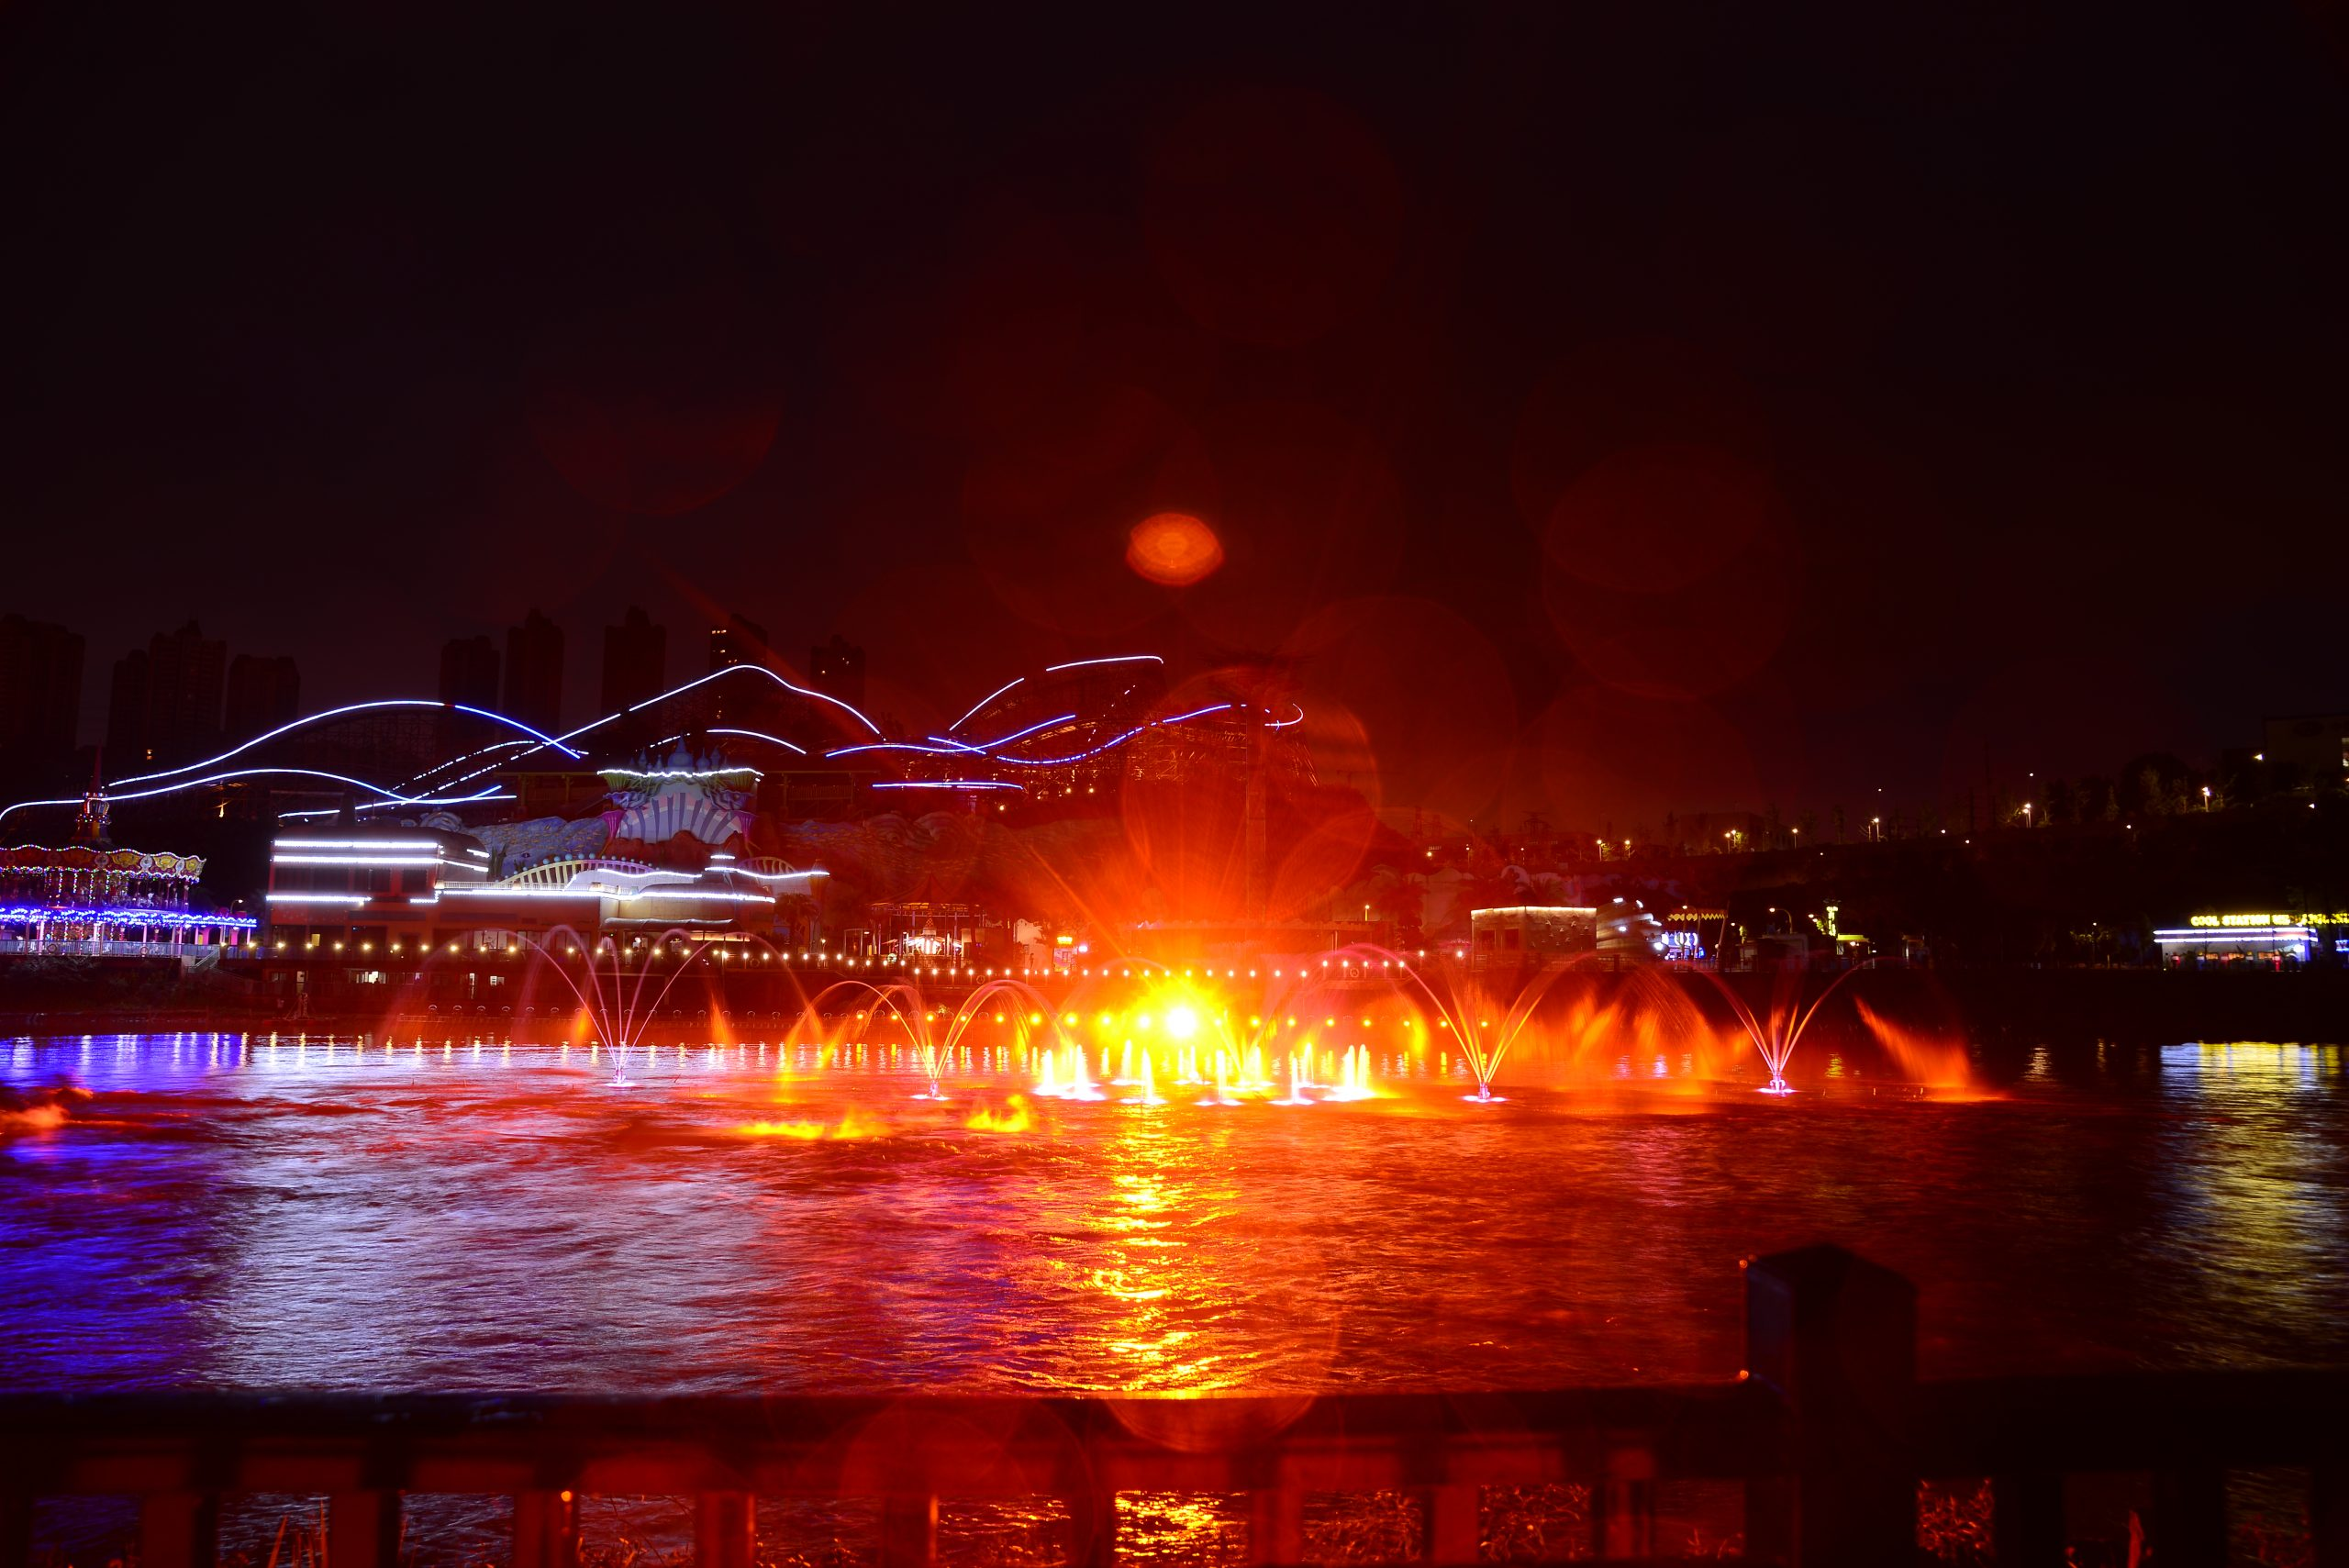 Chongqing, HVE music festival